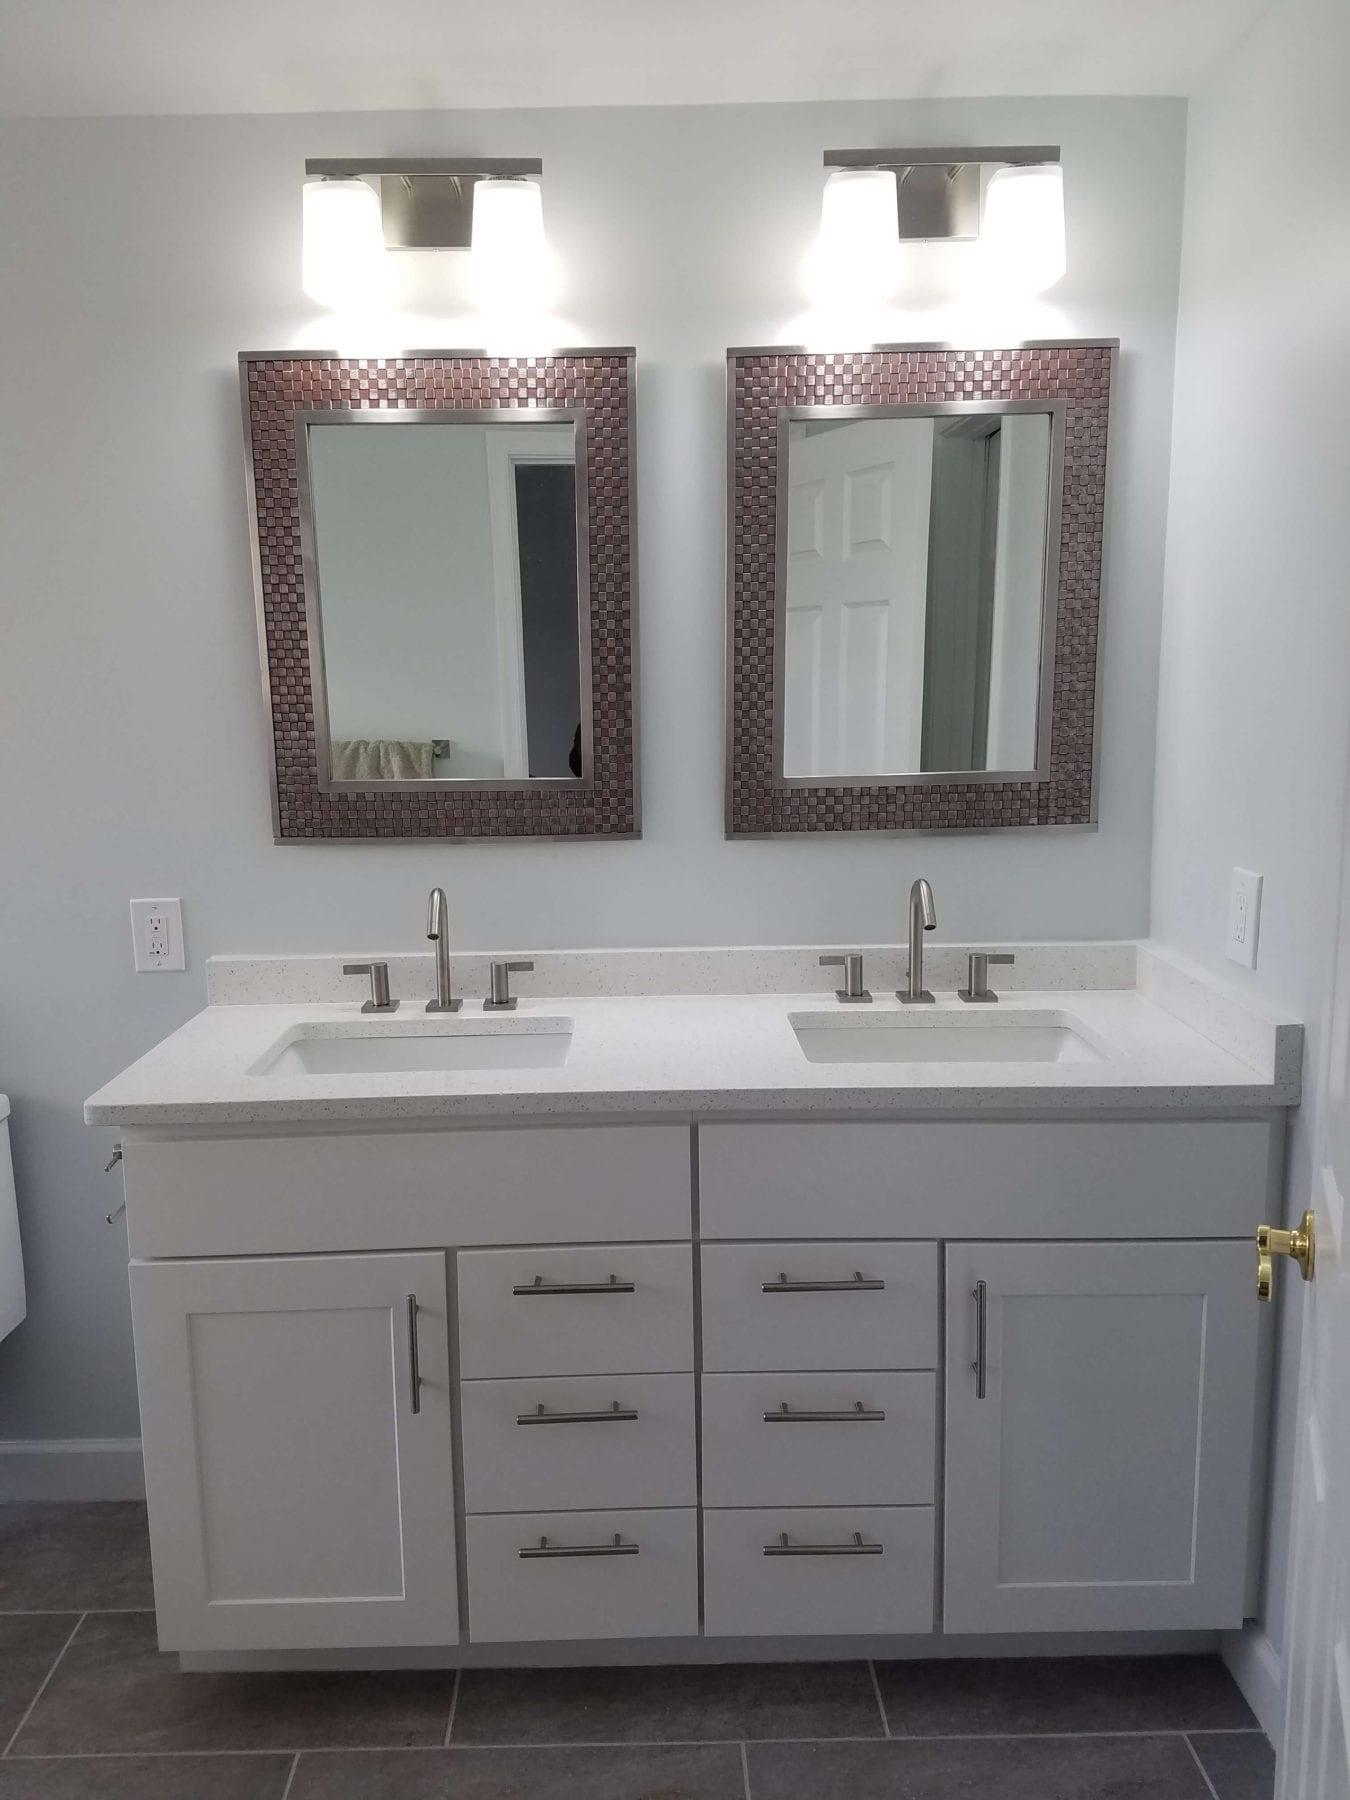 Federal Hill Bath Remodel TradeMark Construction - Bathroom showrooms baltimore